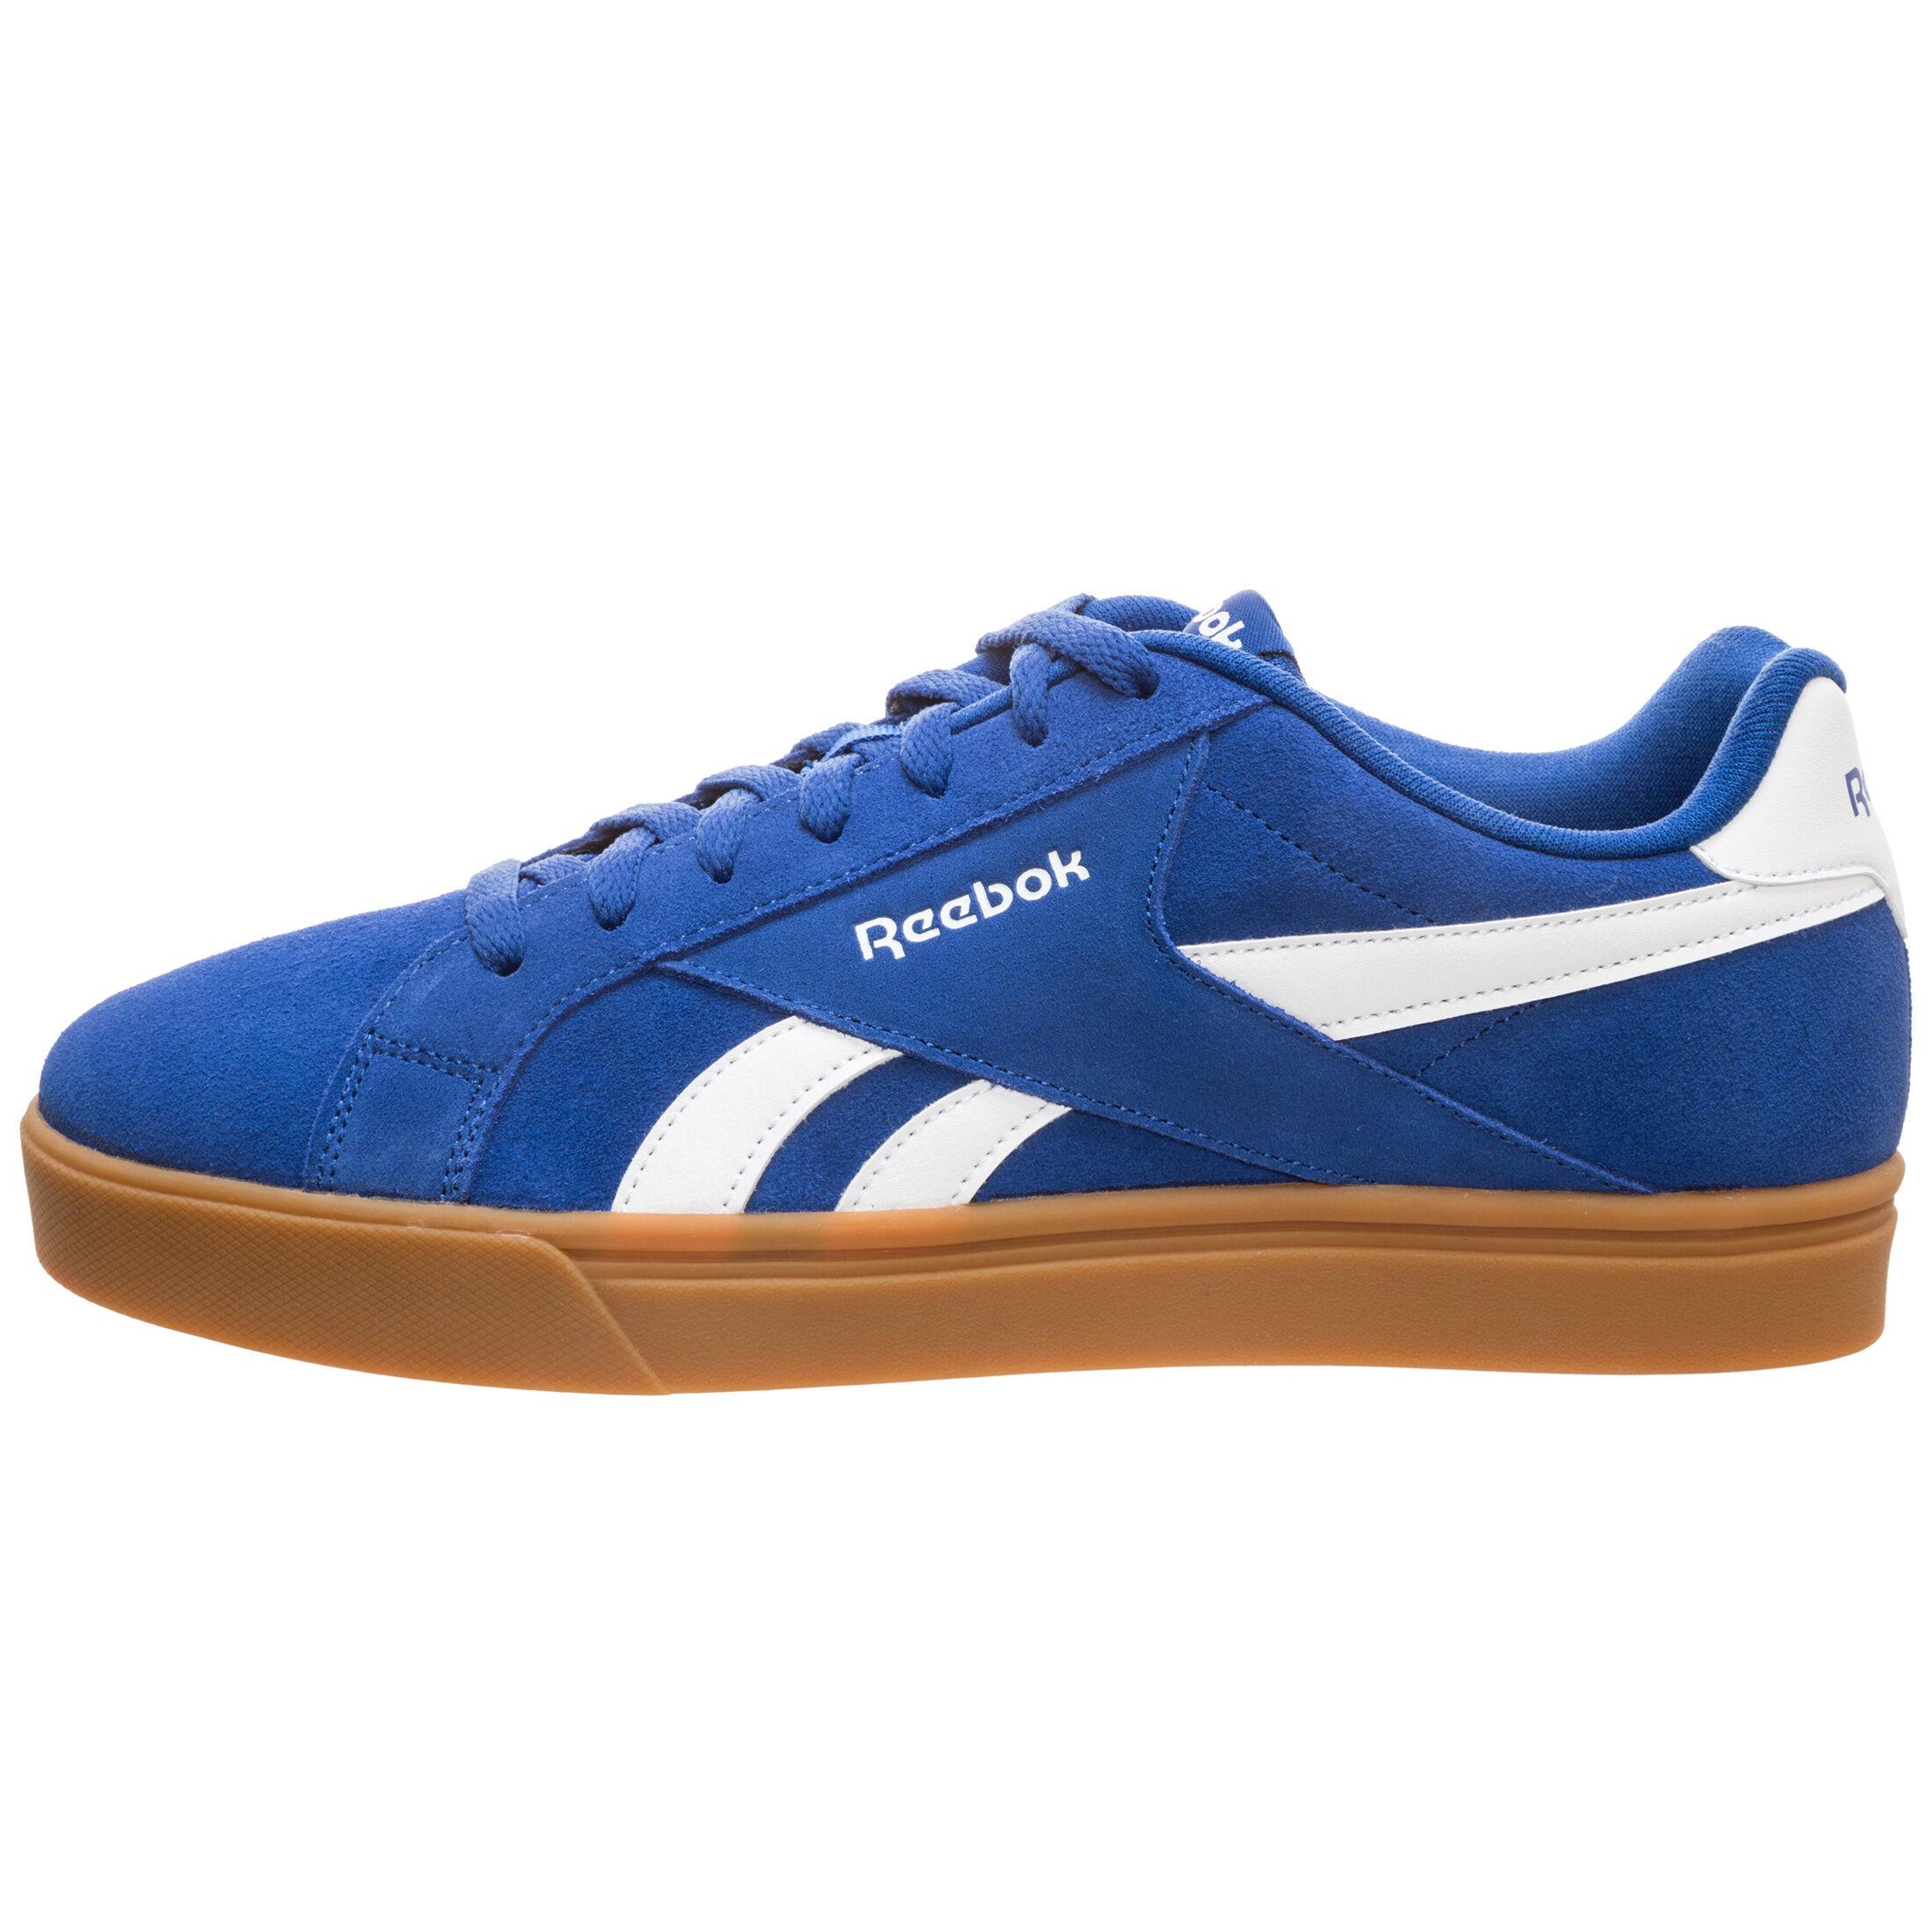 Reebok Reebok Royal Complete 3.0 Low Shoes Sneaker Herren